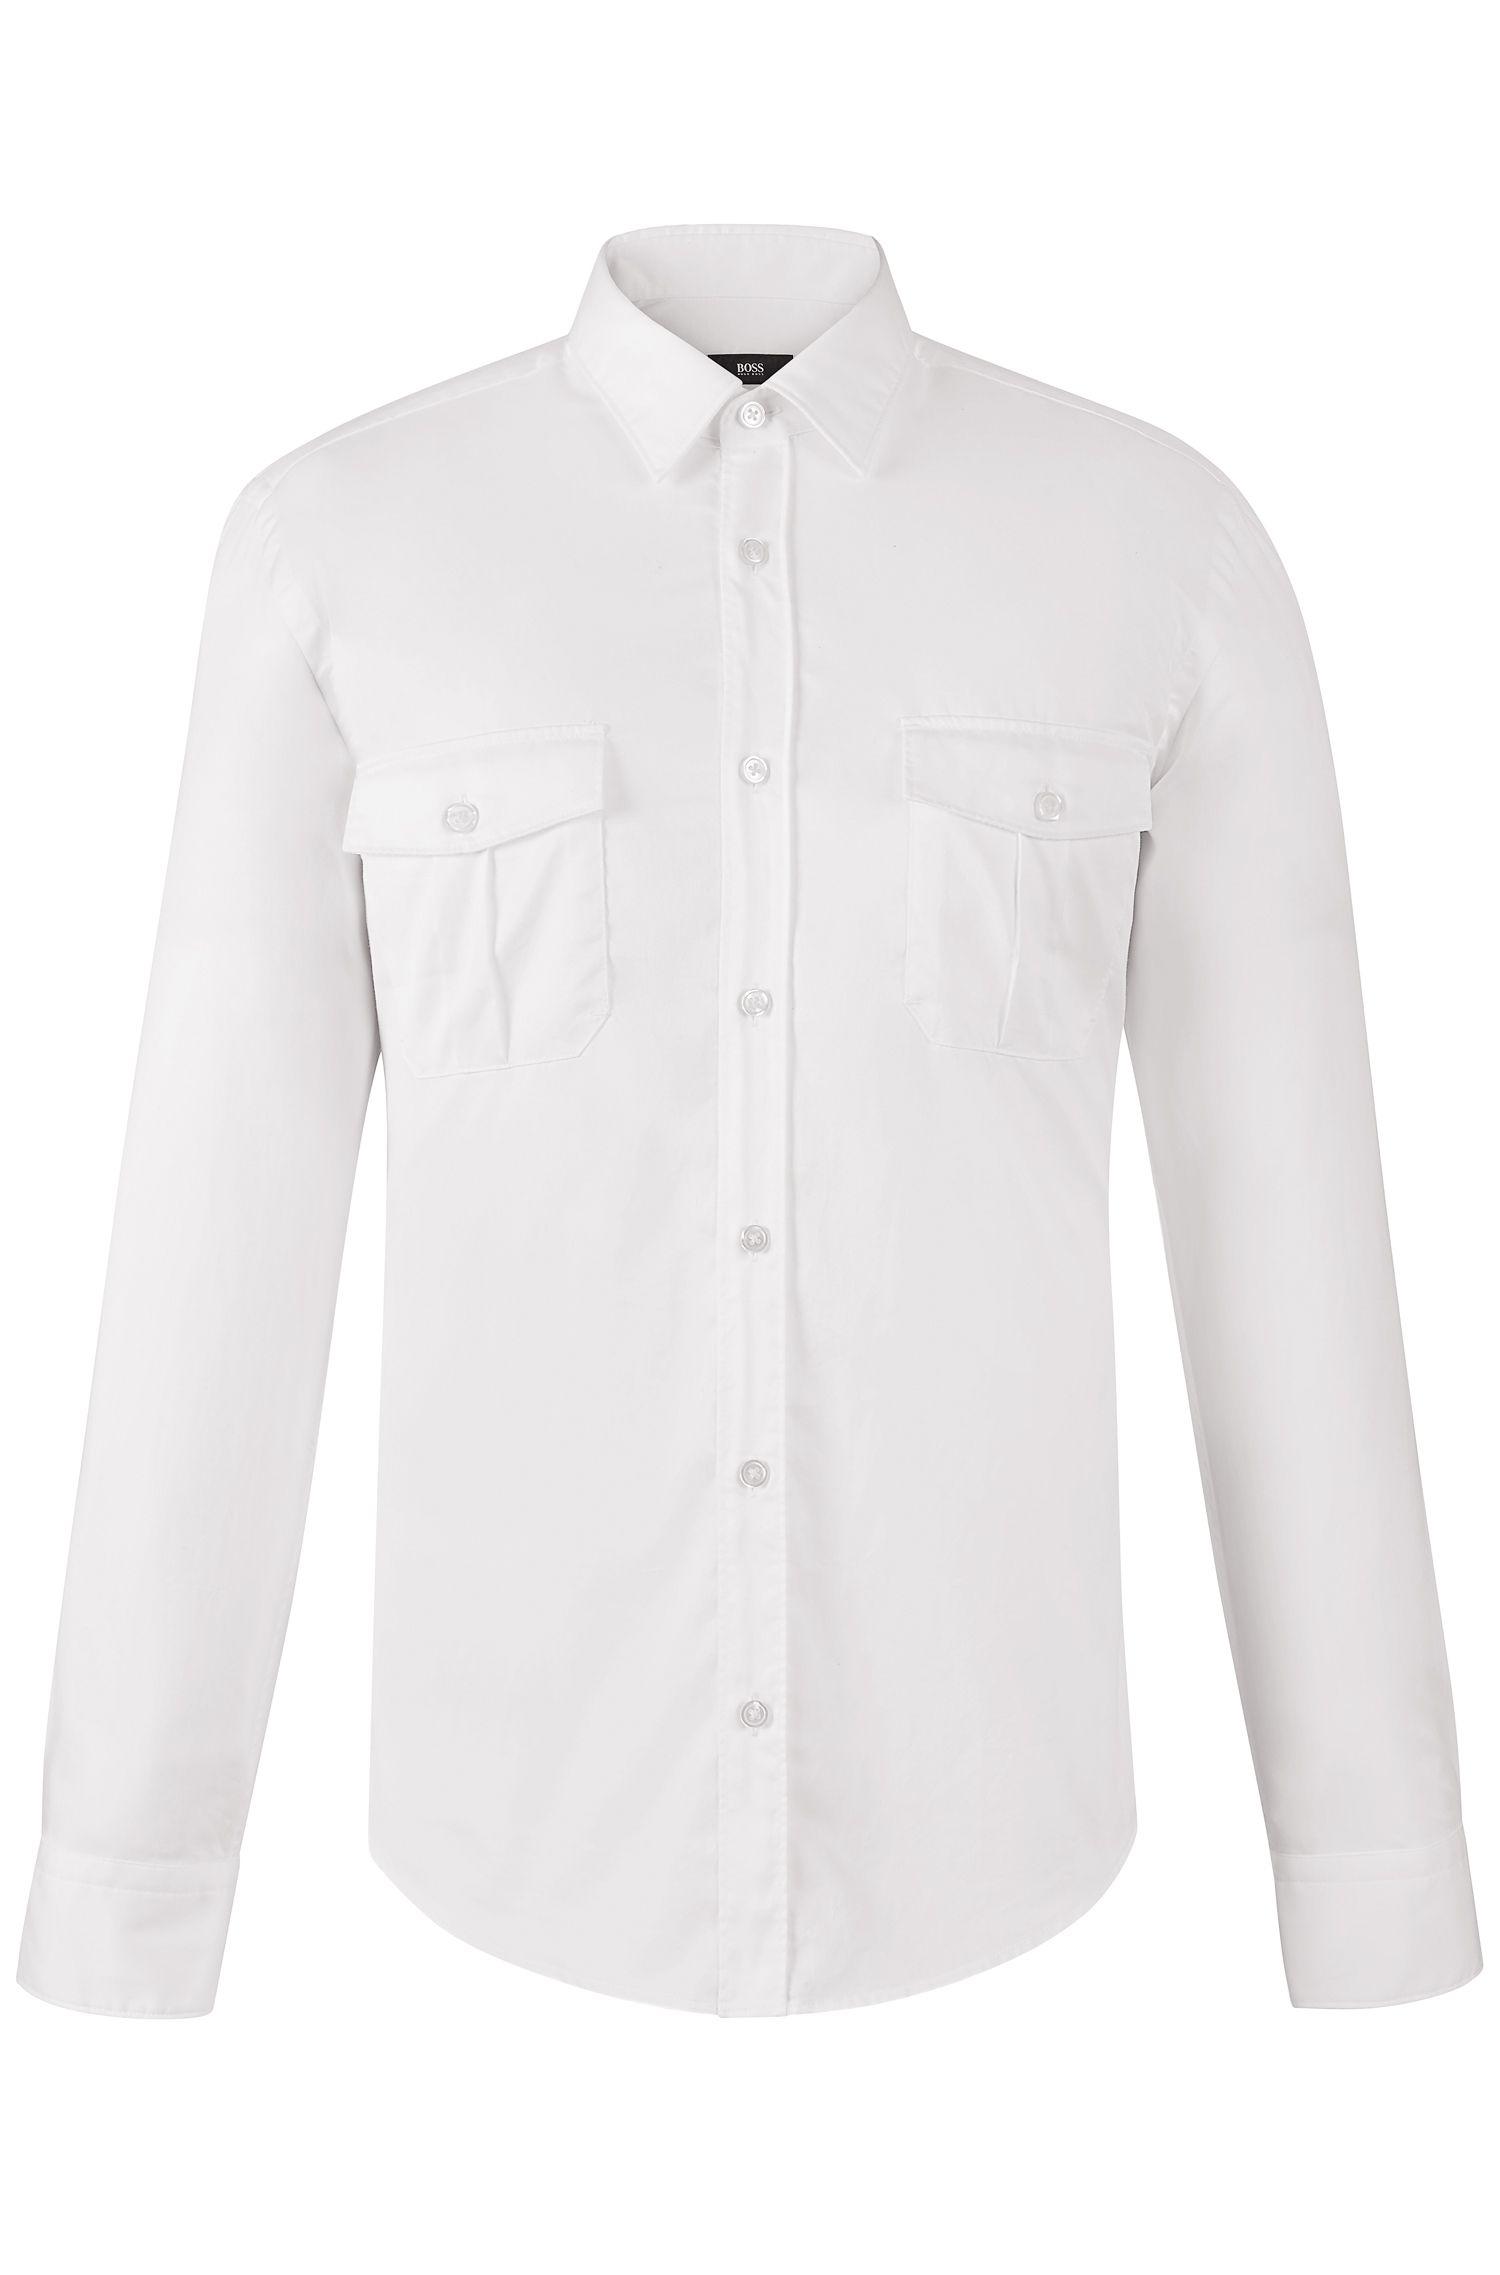 'Ramsey' | Slim Fit, Cotton Button Down Shirt